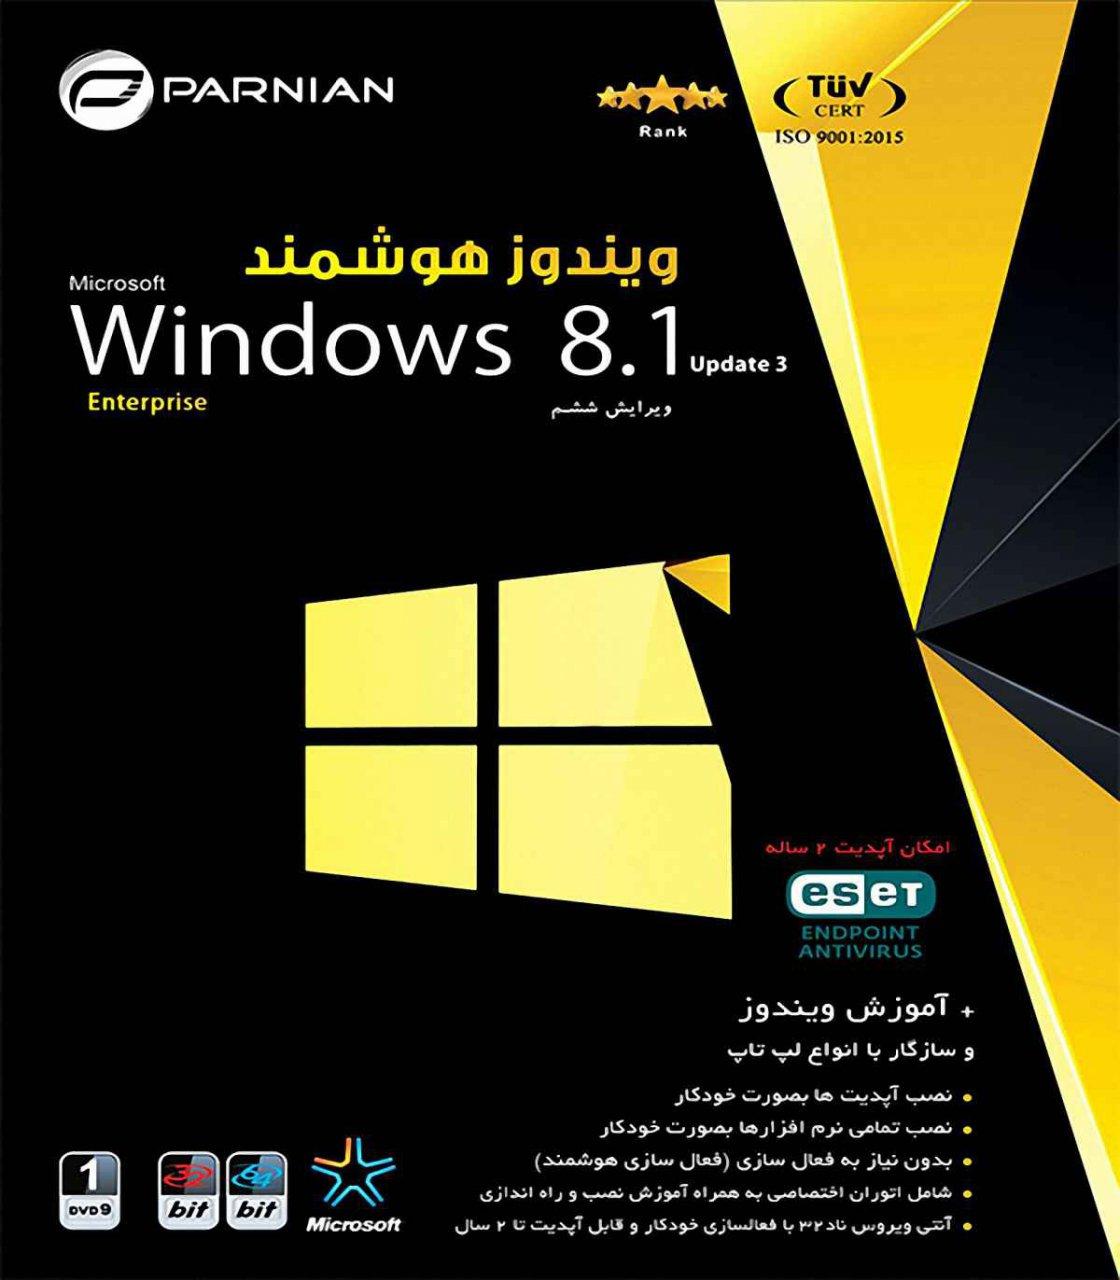 سیستم عامل ویندوز 8.1 هوشمند نشر پرنیان